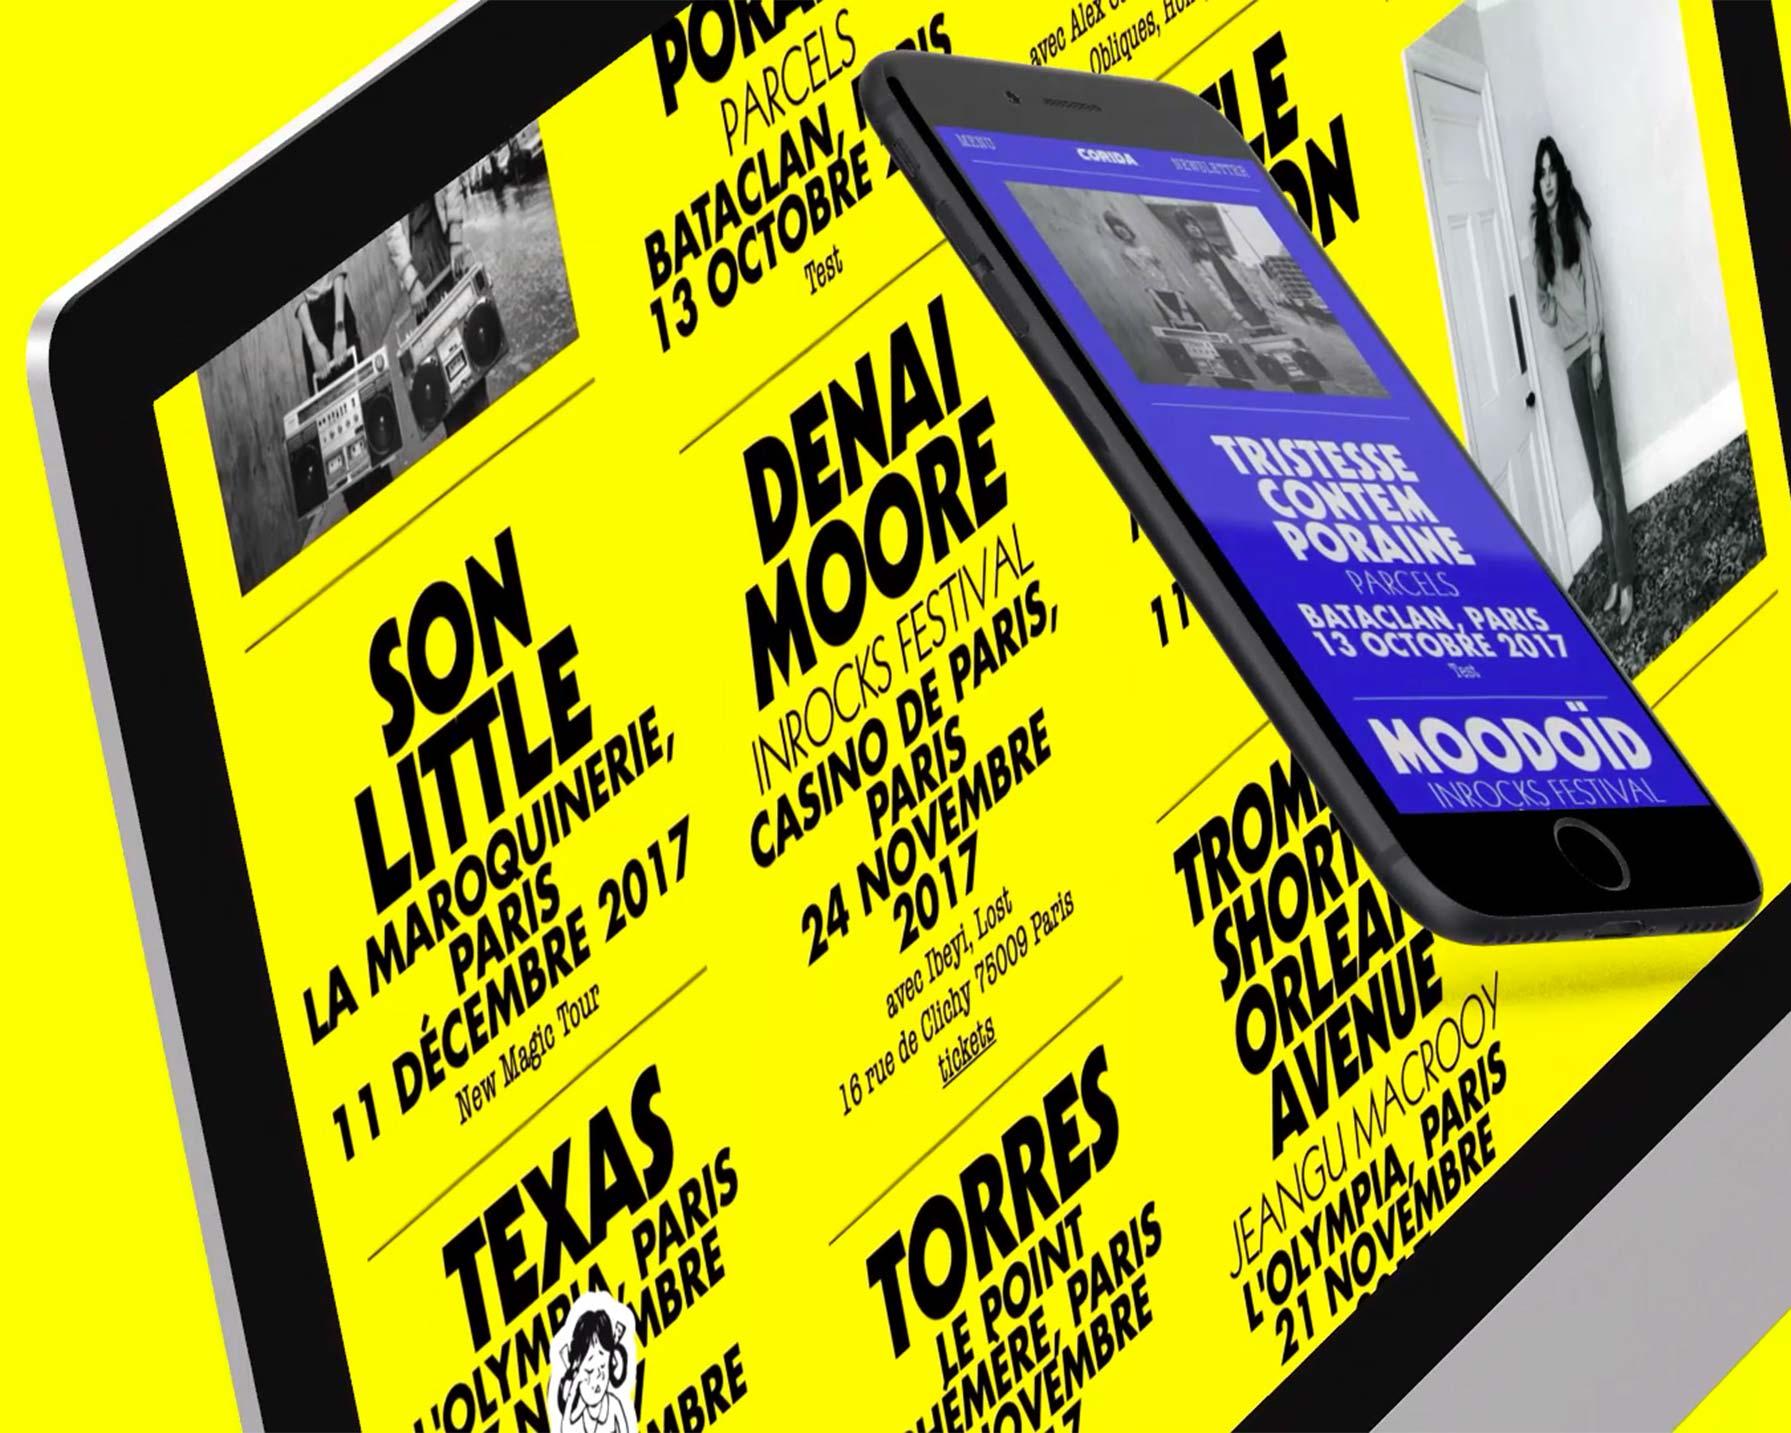 Corida website project made by Perimetre, a creative studio based in Paris